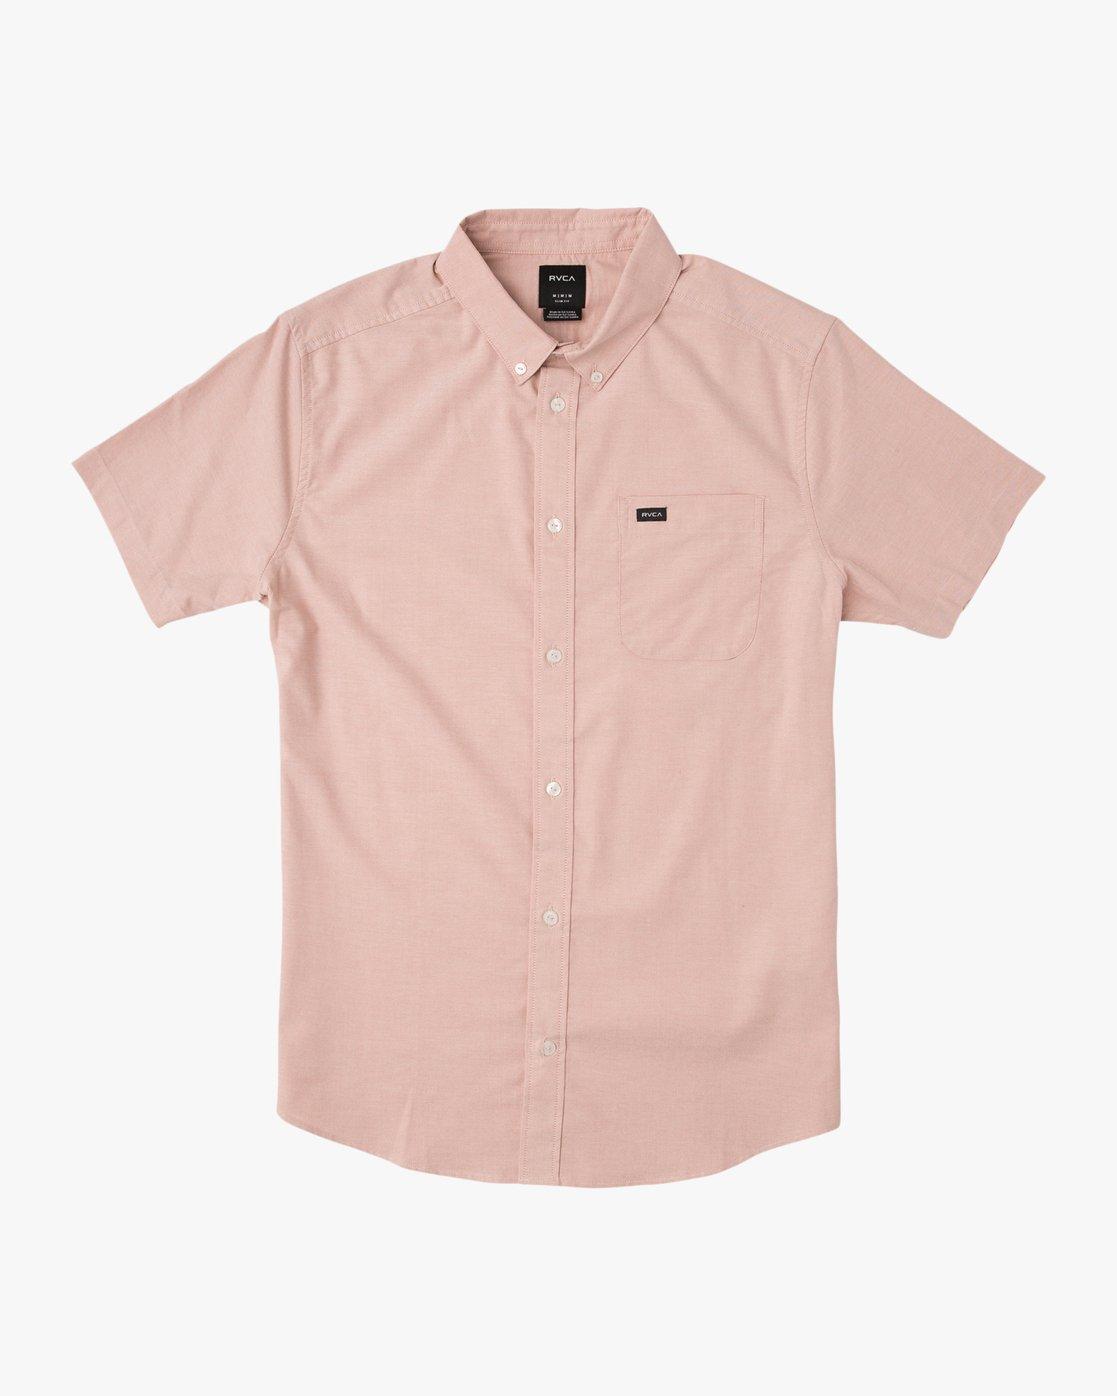 0 That'll Do Stretch Short Sleeve Shirt Brown MK515TDS RVCA